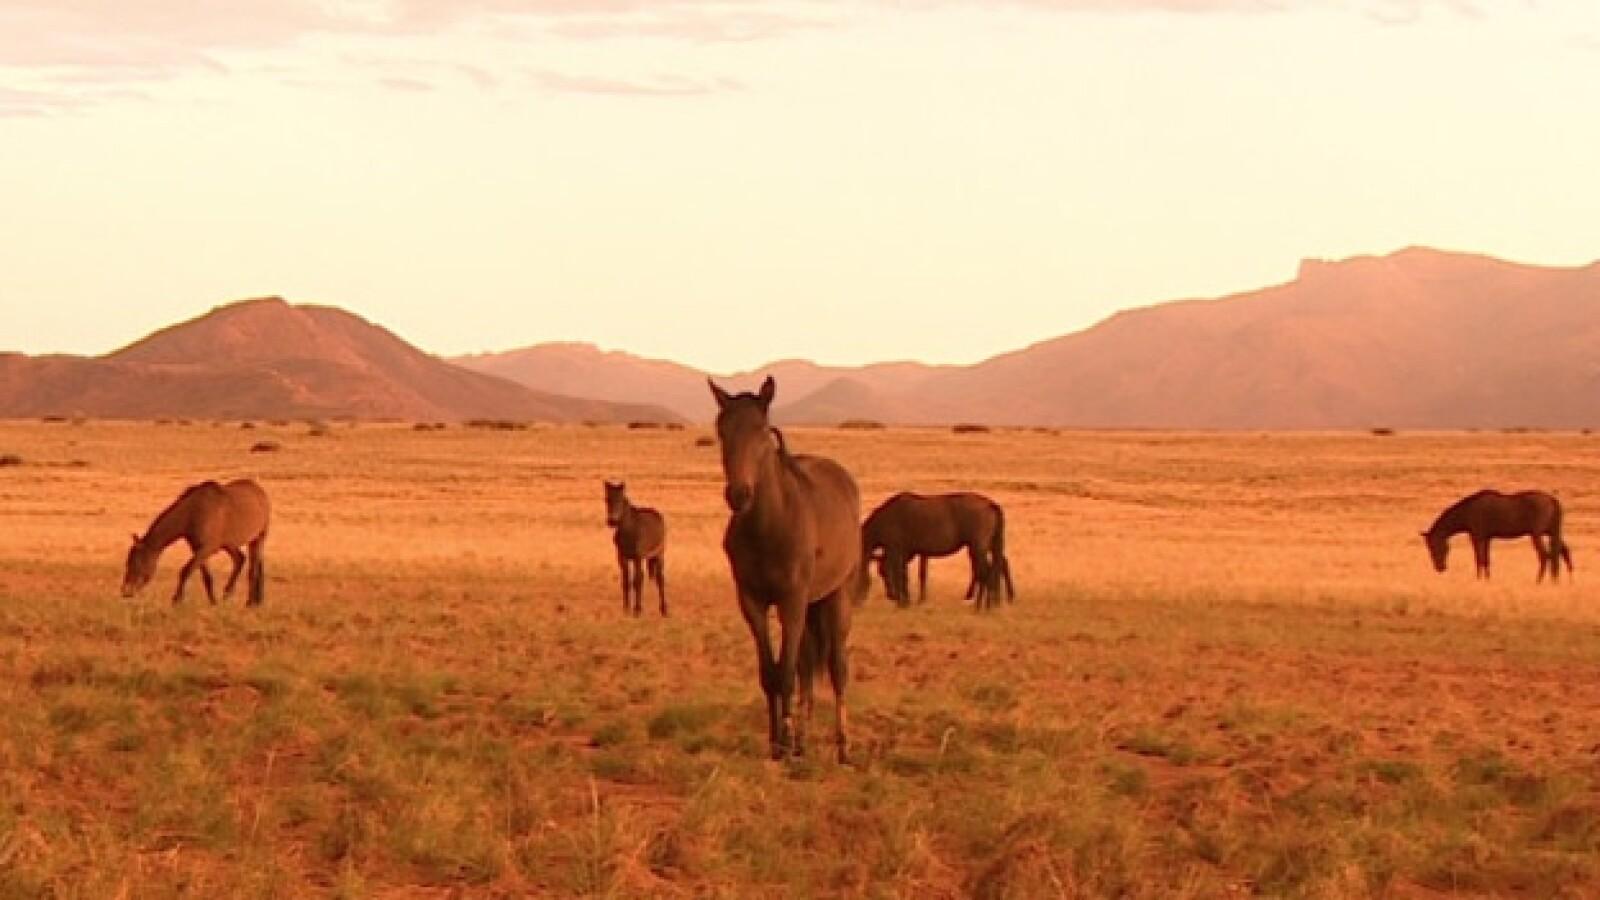 Kolmanskop Desierto Namib  africa namibia pueblos fantasma caballos diamantes